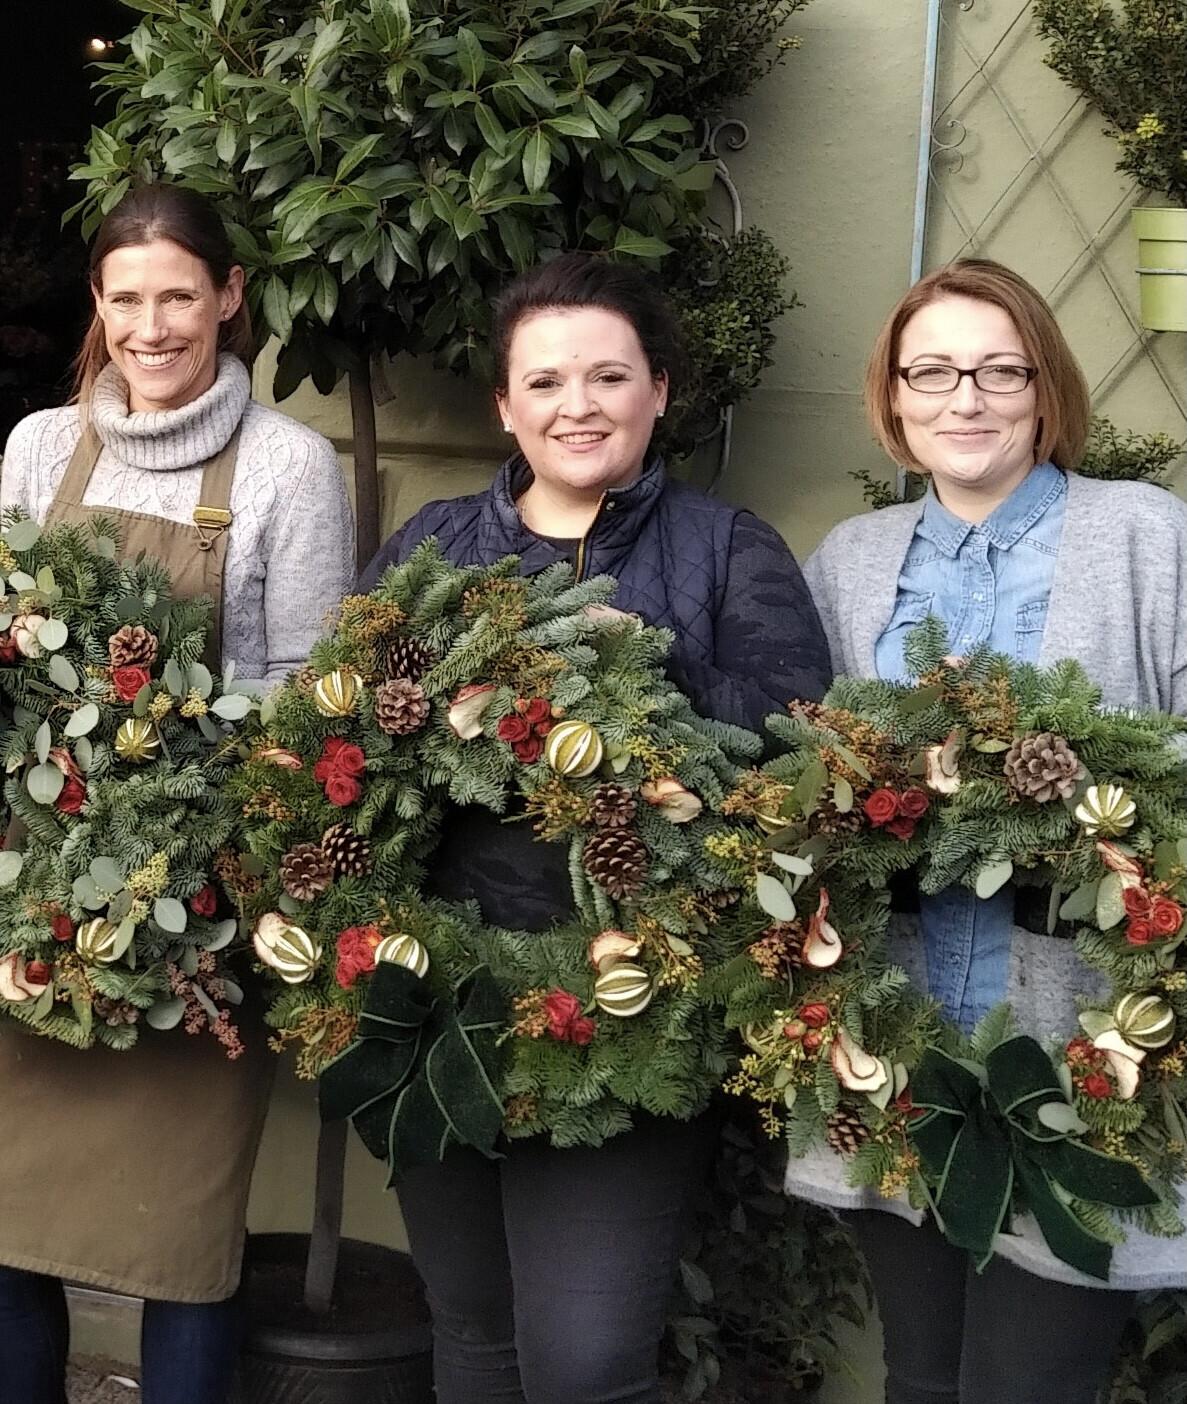 Wreath Making - Thu 3rd Dec 2020 2pm